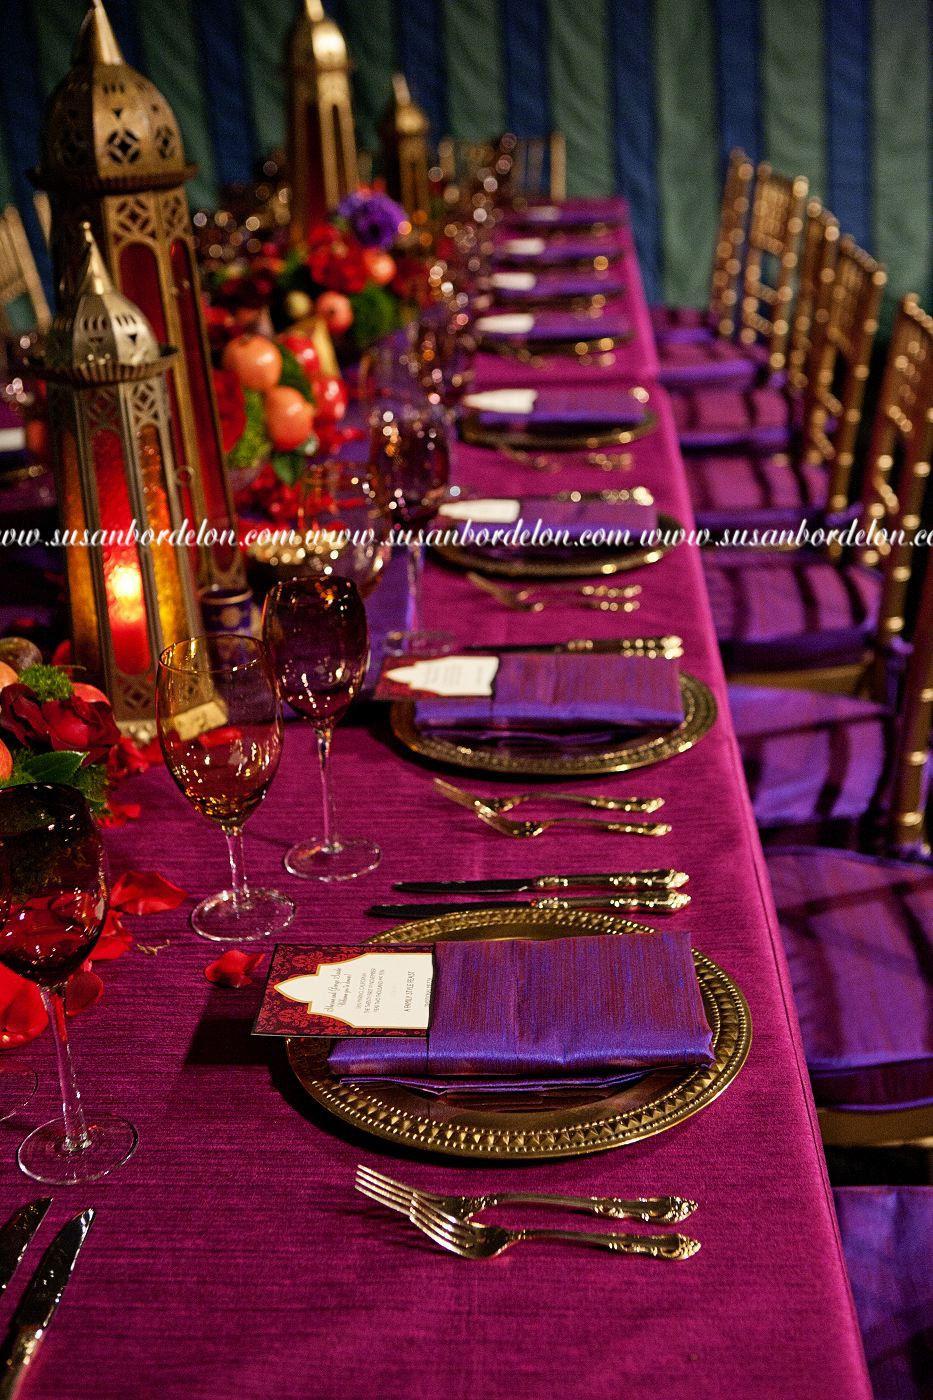 Arabian Nights Pelicula Completa Español decadent bohemian dininglove the sumptuous shades of